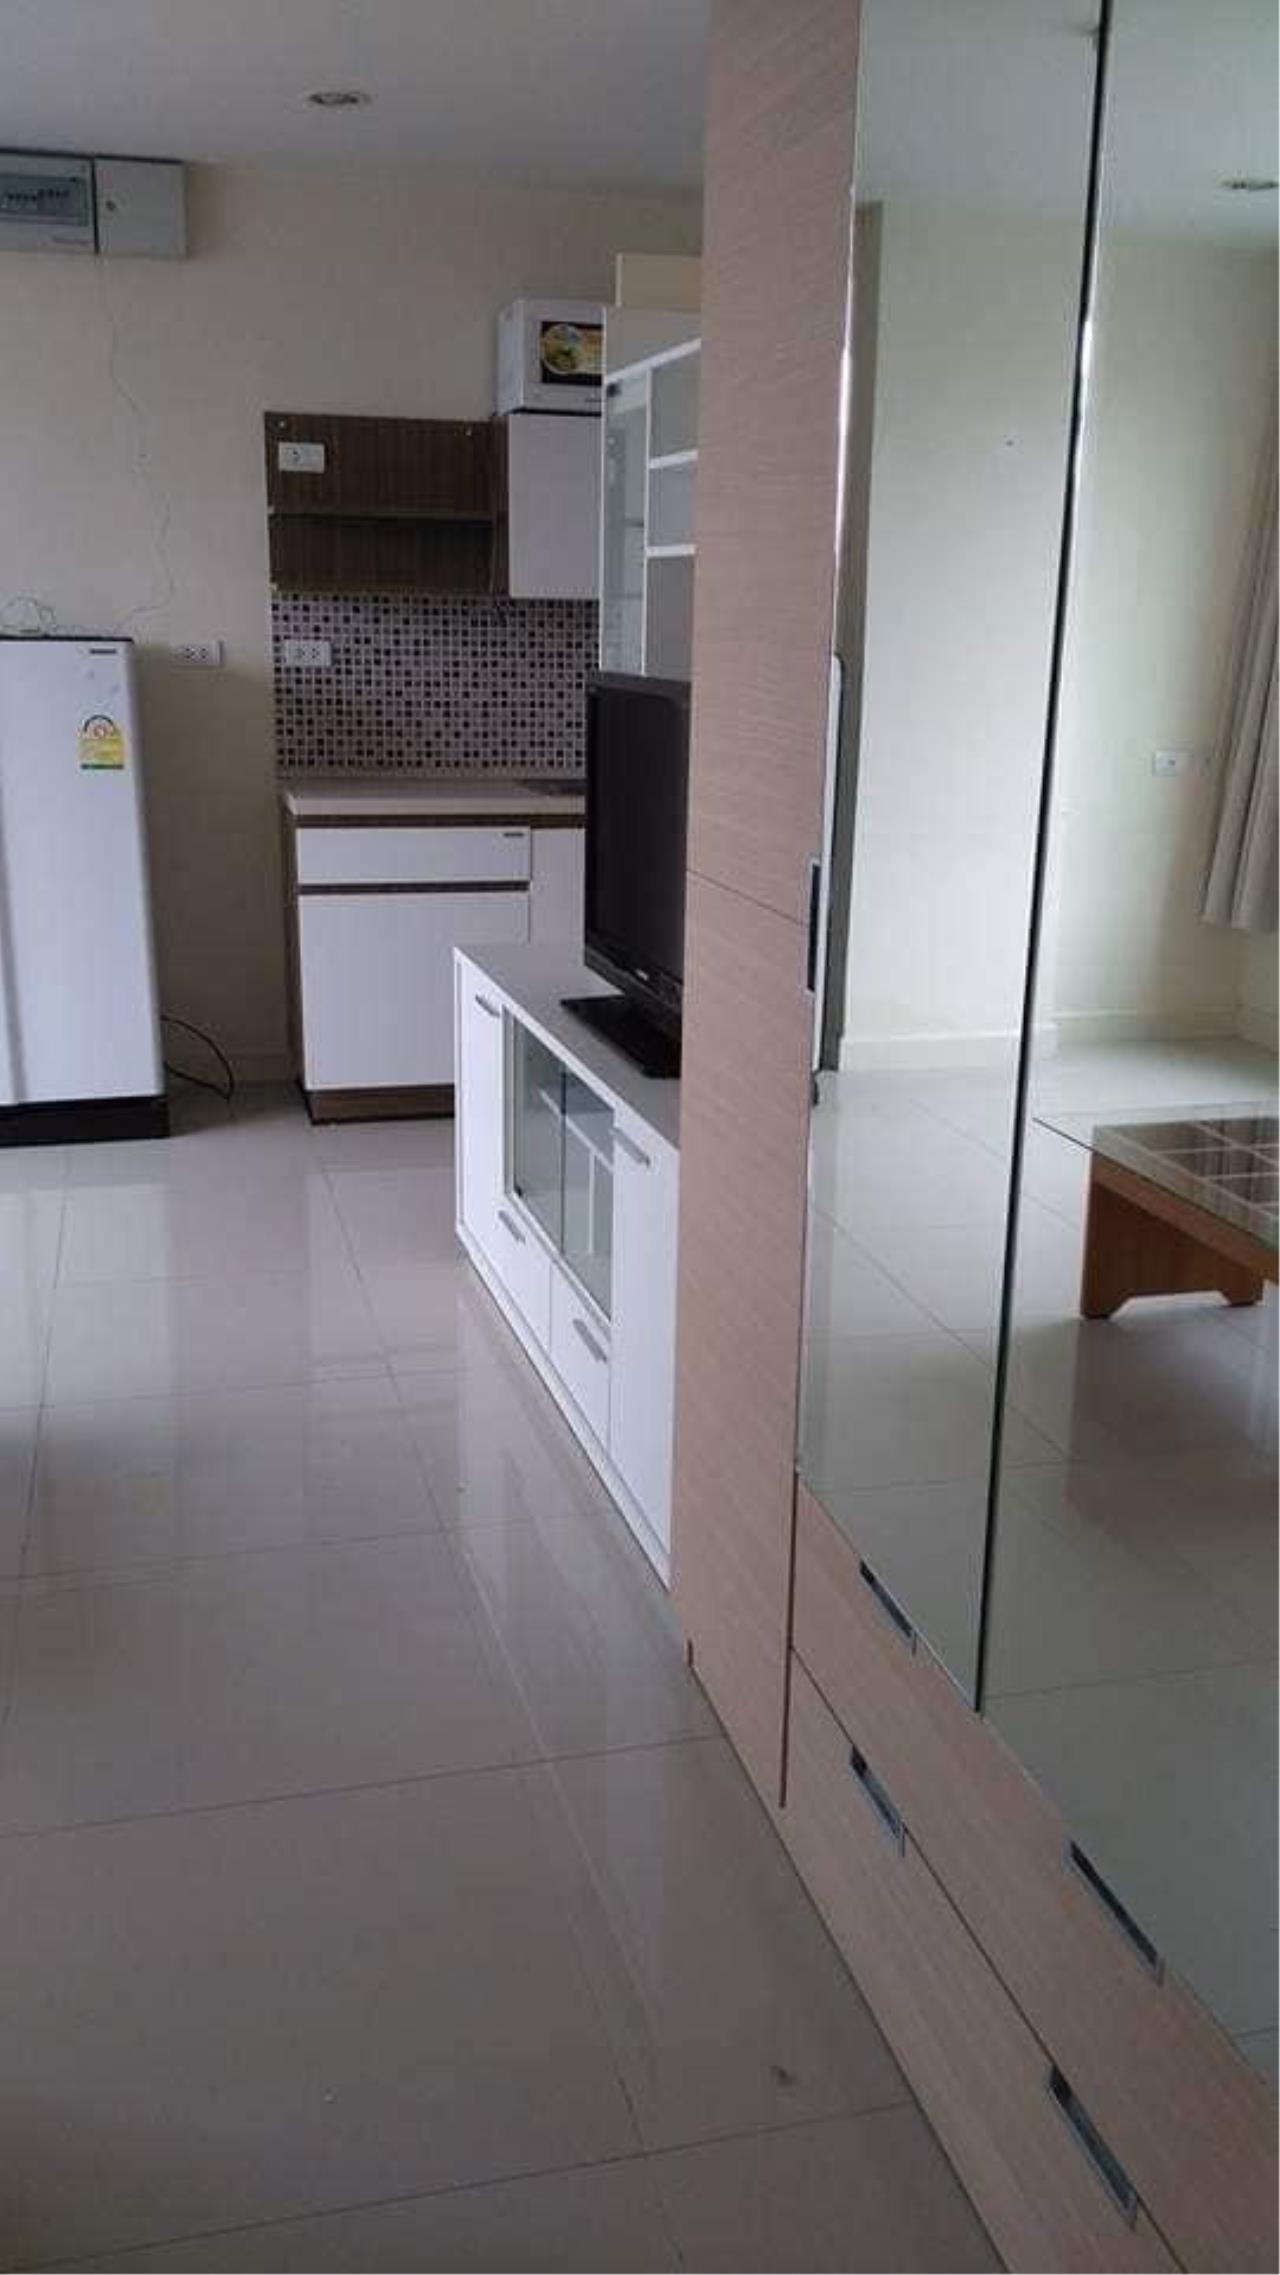 Agent - Phapayawarin Agency's Wish @ Siam for Rent, 1 Bedroom 1 Bathroom, 36 Sq.m., BTS Ratchathewi 4